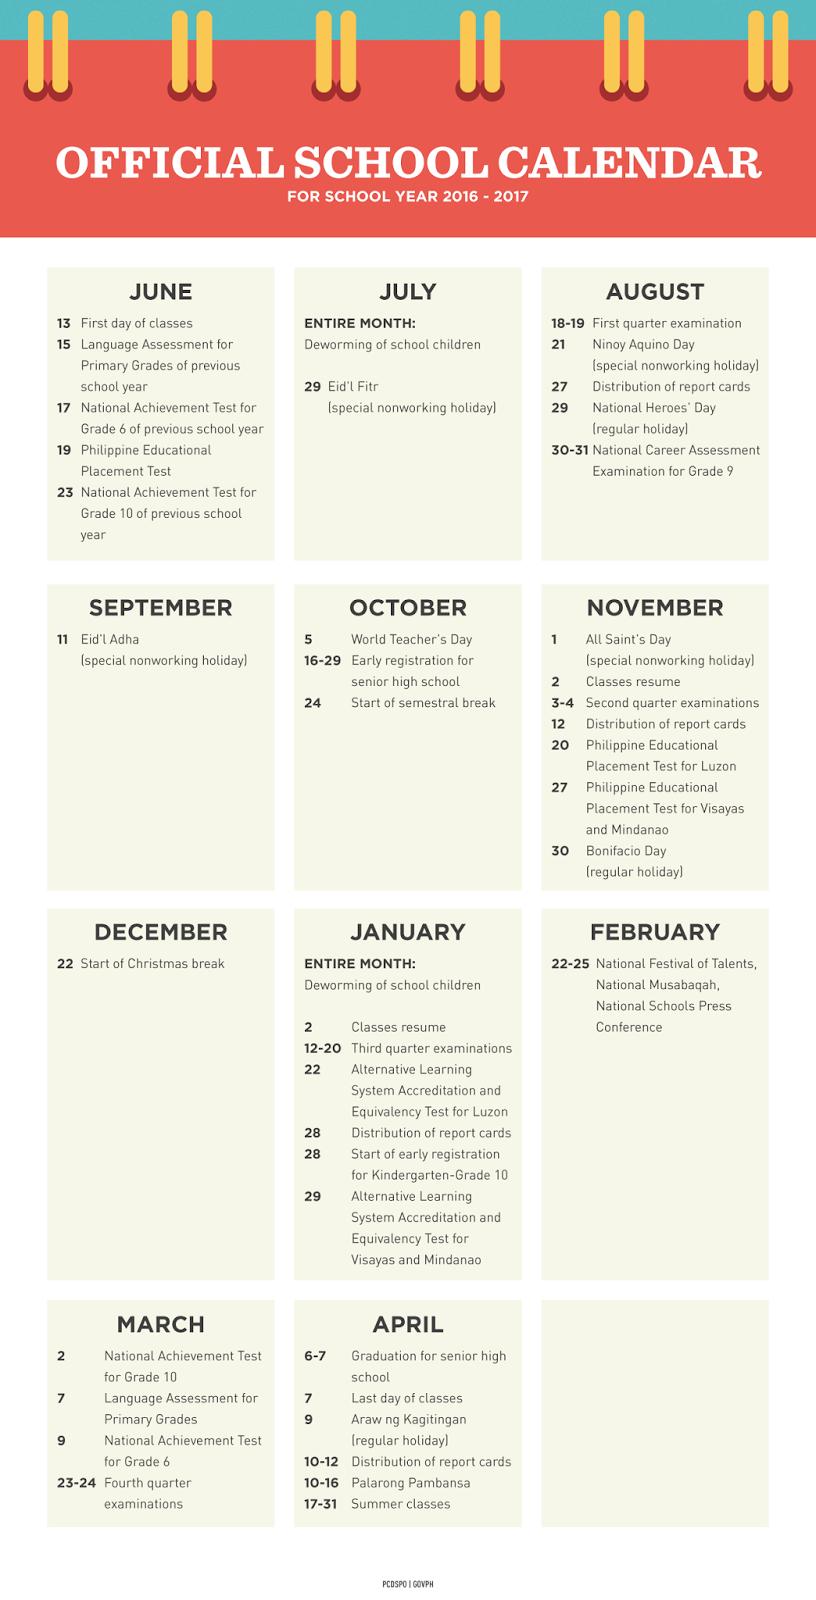 school calendar 2017 2018 philippines pdf